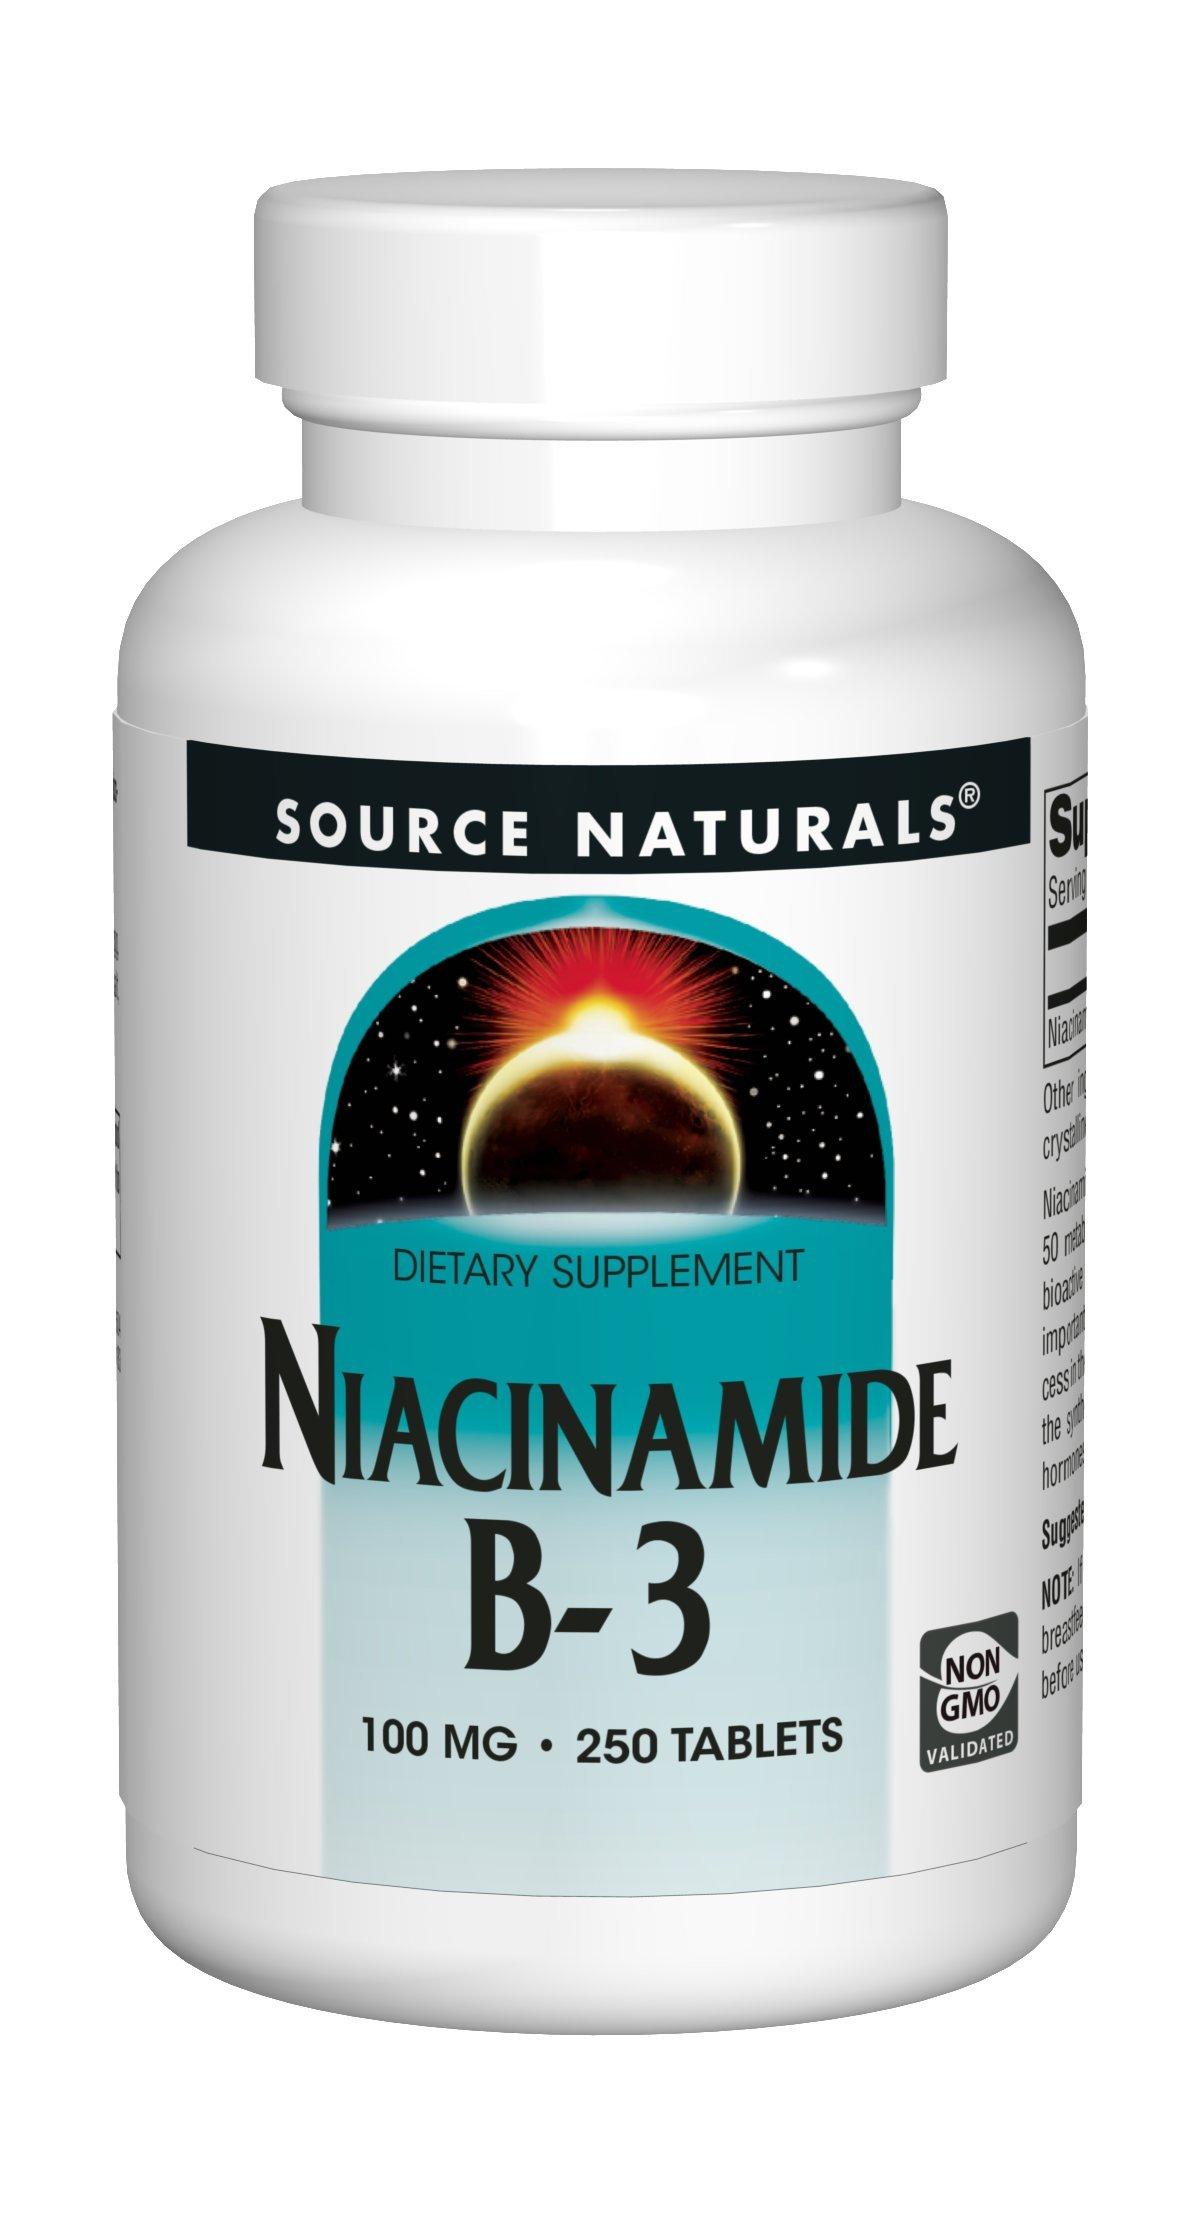 Source Naturals Niacinamide 100mg Vitamin B3 Supplement - Flush Free - 250 Tablets